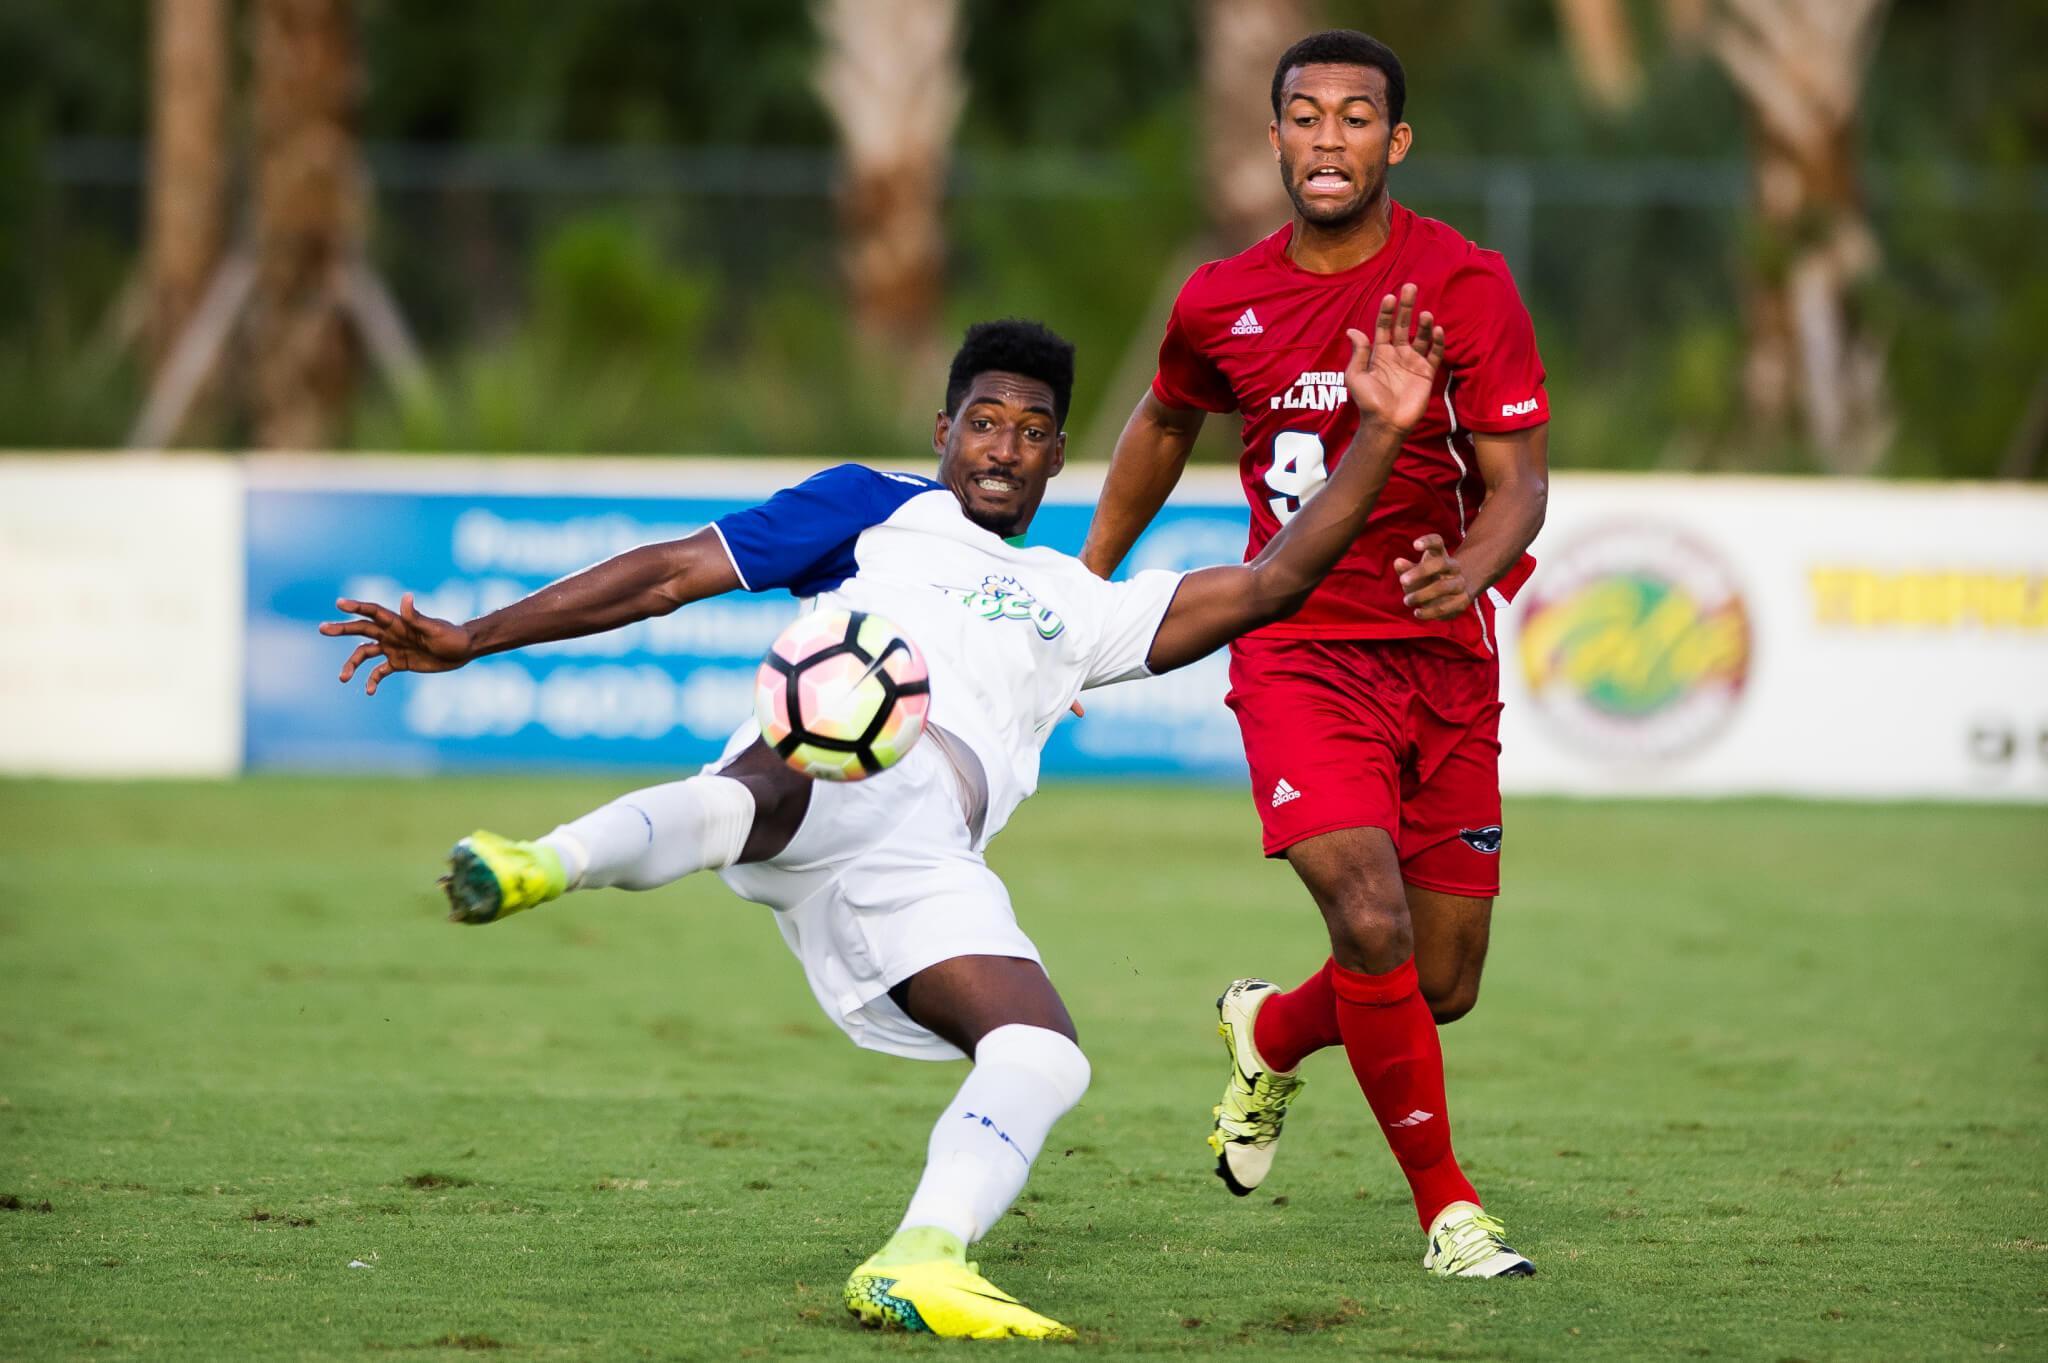 FGCU men's soccer extends win streak to seven after 11 goal shoot out